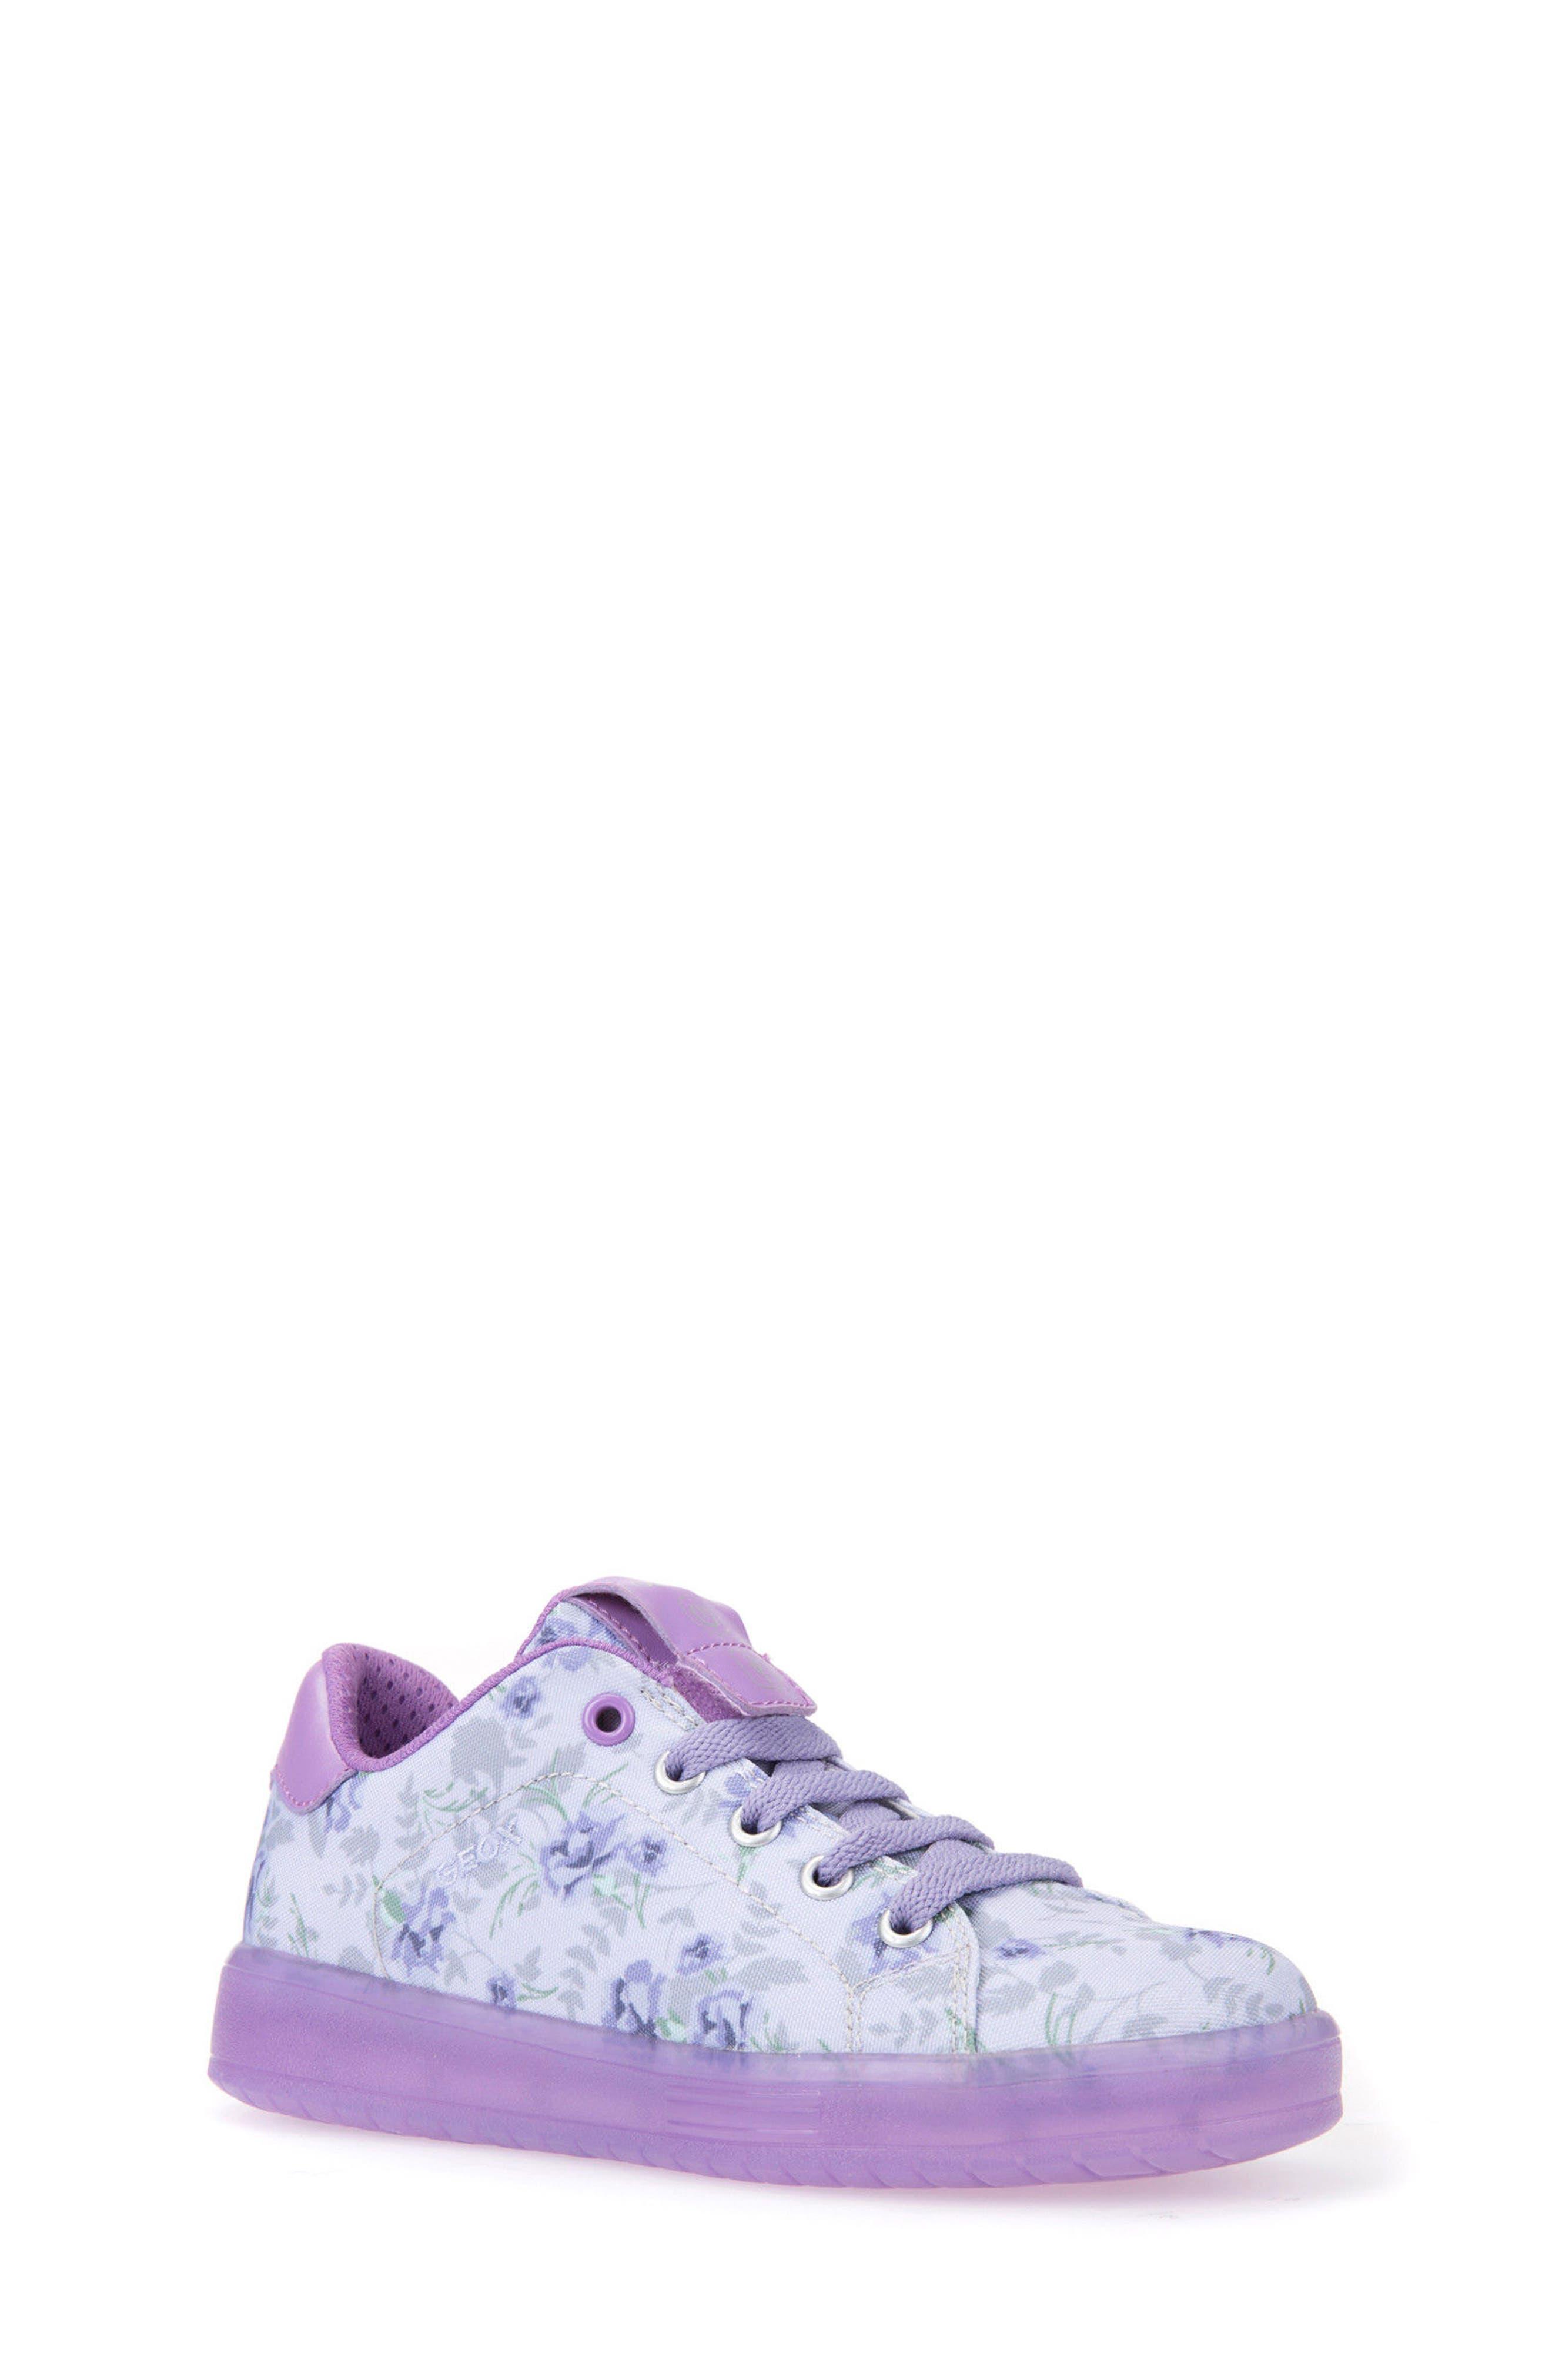 Geox Kommodor Light-Up Sneaker (Toddler, Little Kid & Big Kid)